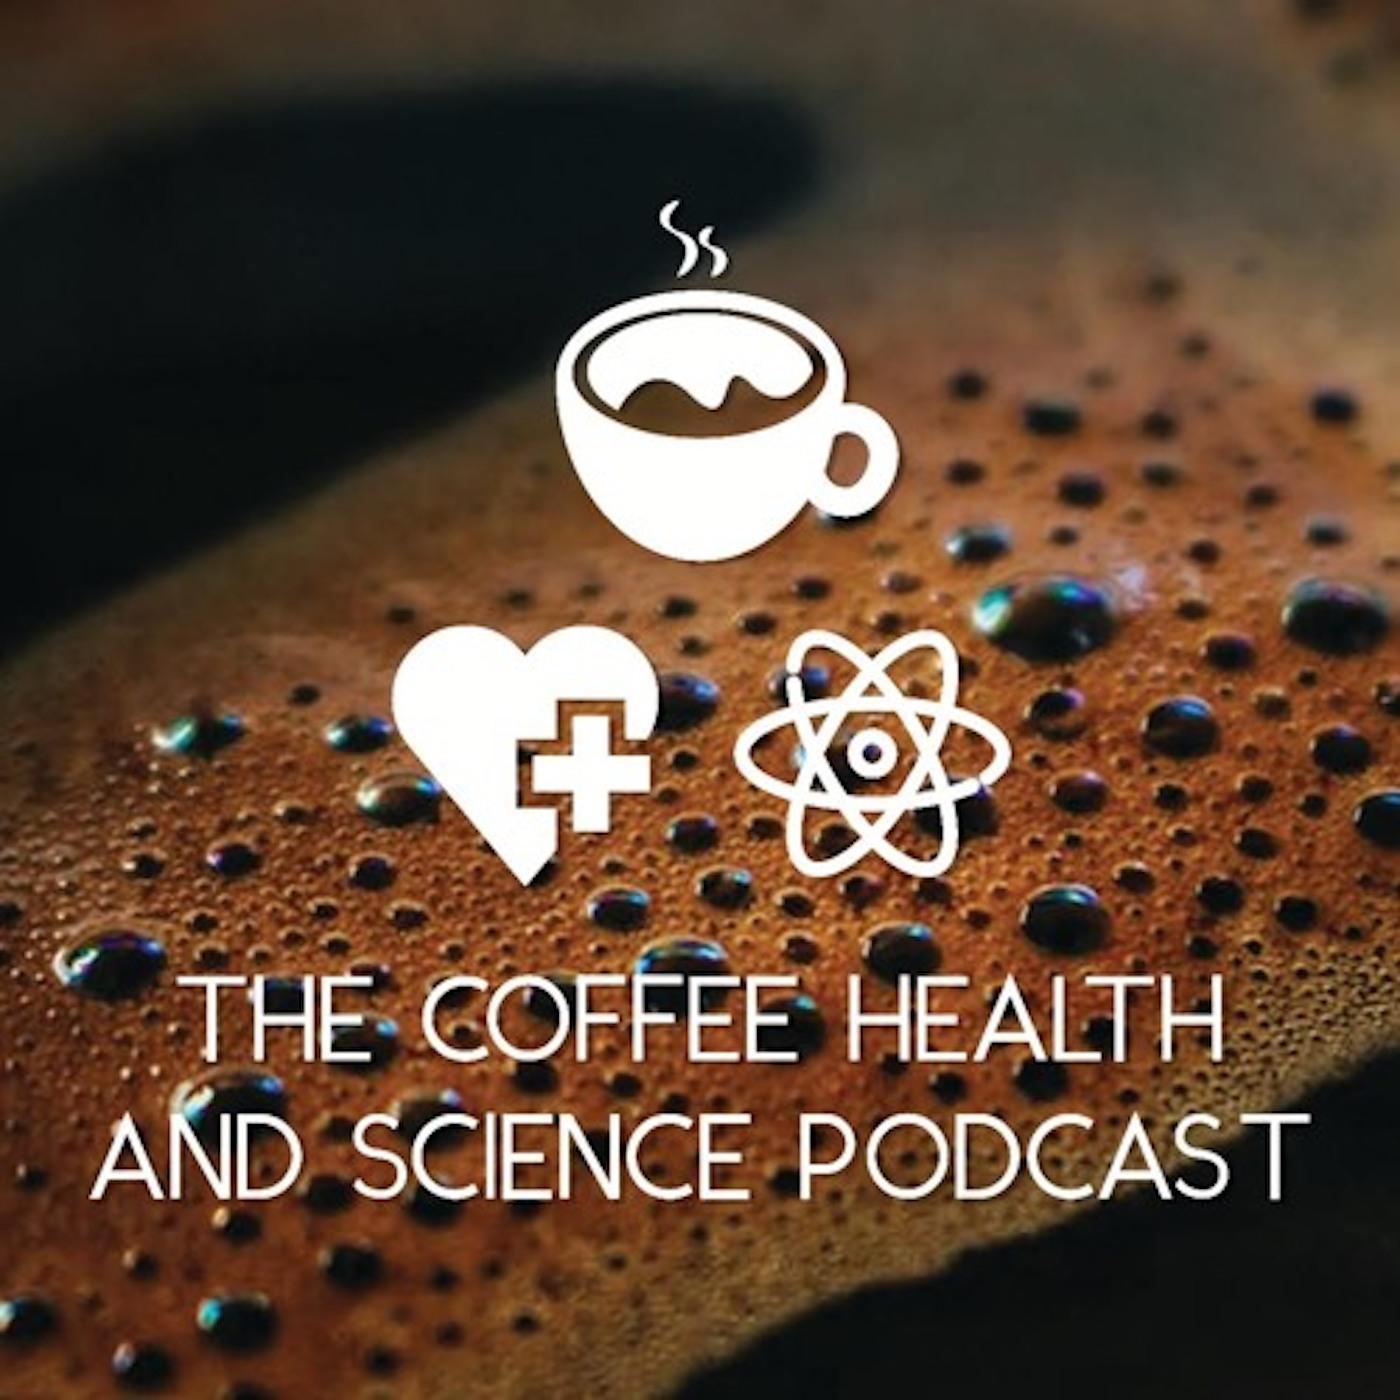 Kona Coffee Deception, Sugary Holiday Drinks, and Edible Coffee Cups, with Dr. Coffee